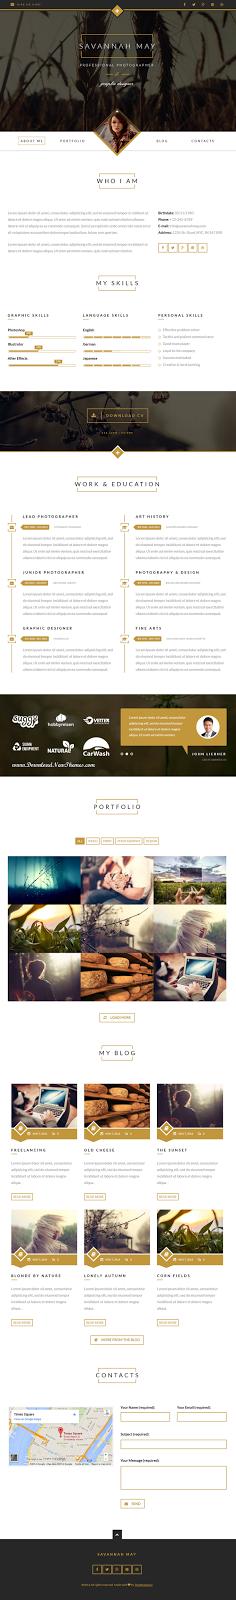 Best Responsive WordPress #vCard #Portfolio Template #resume #webdesign